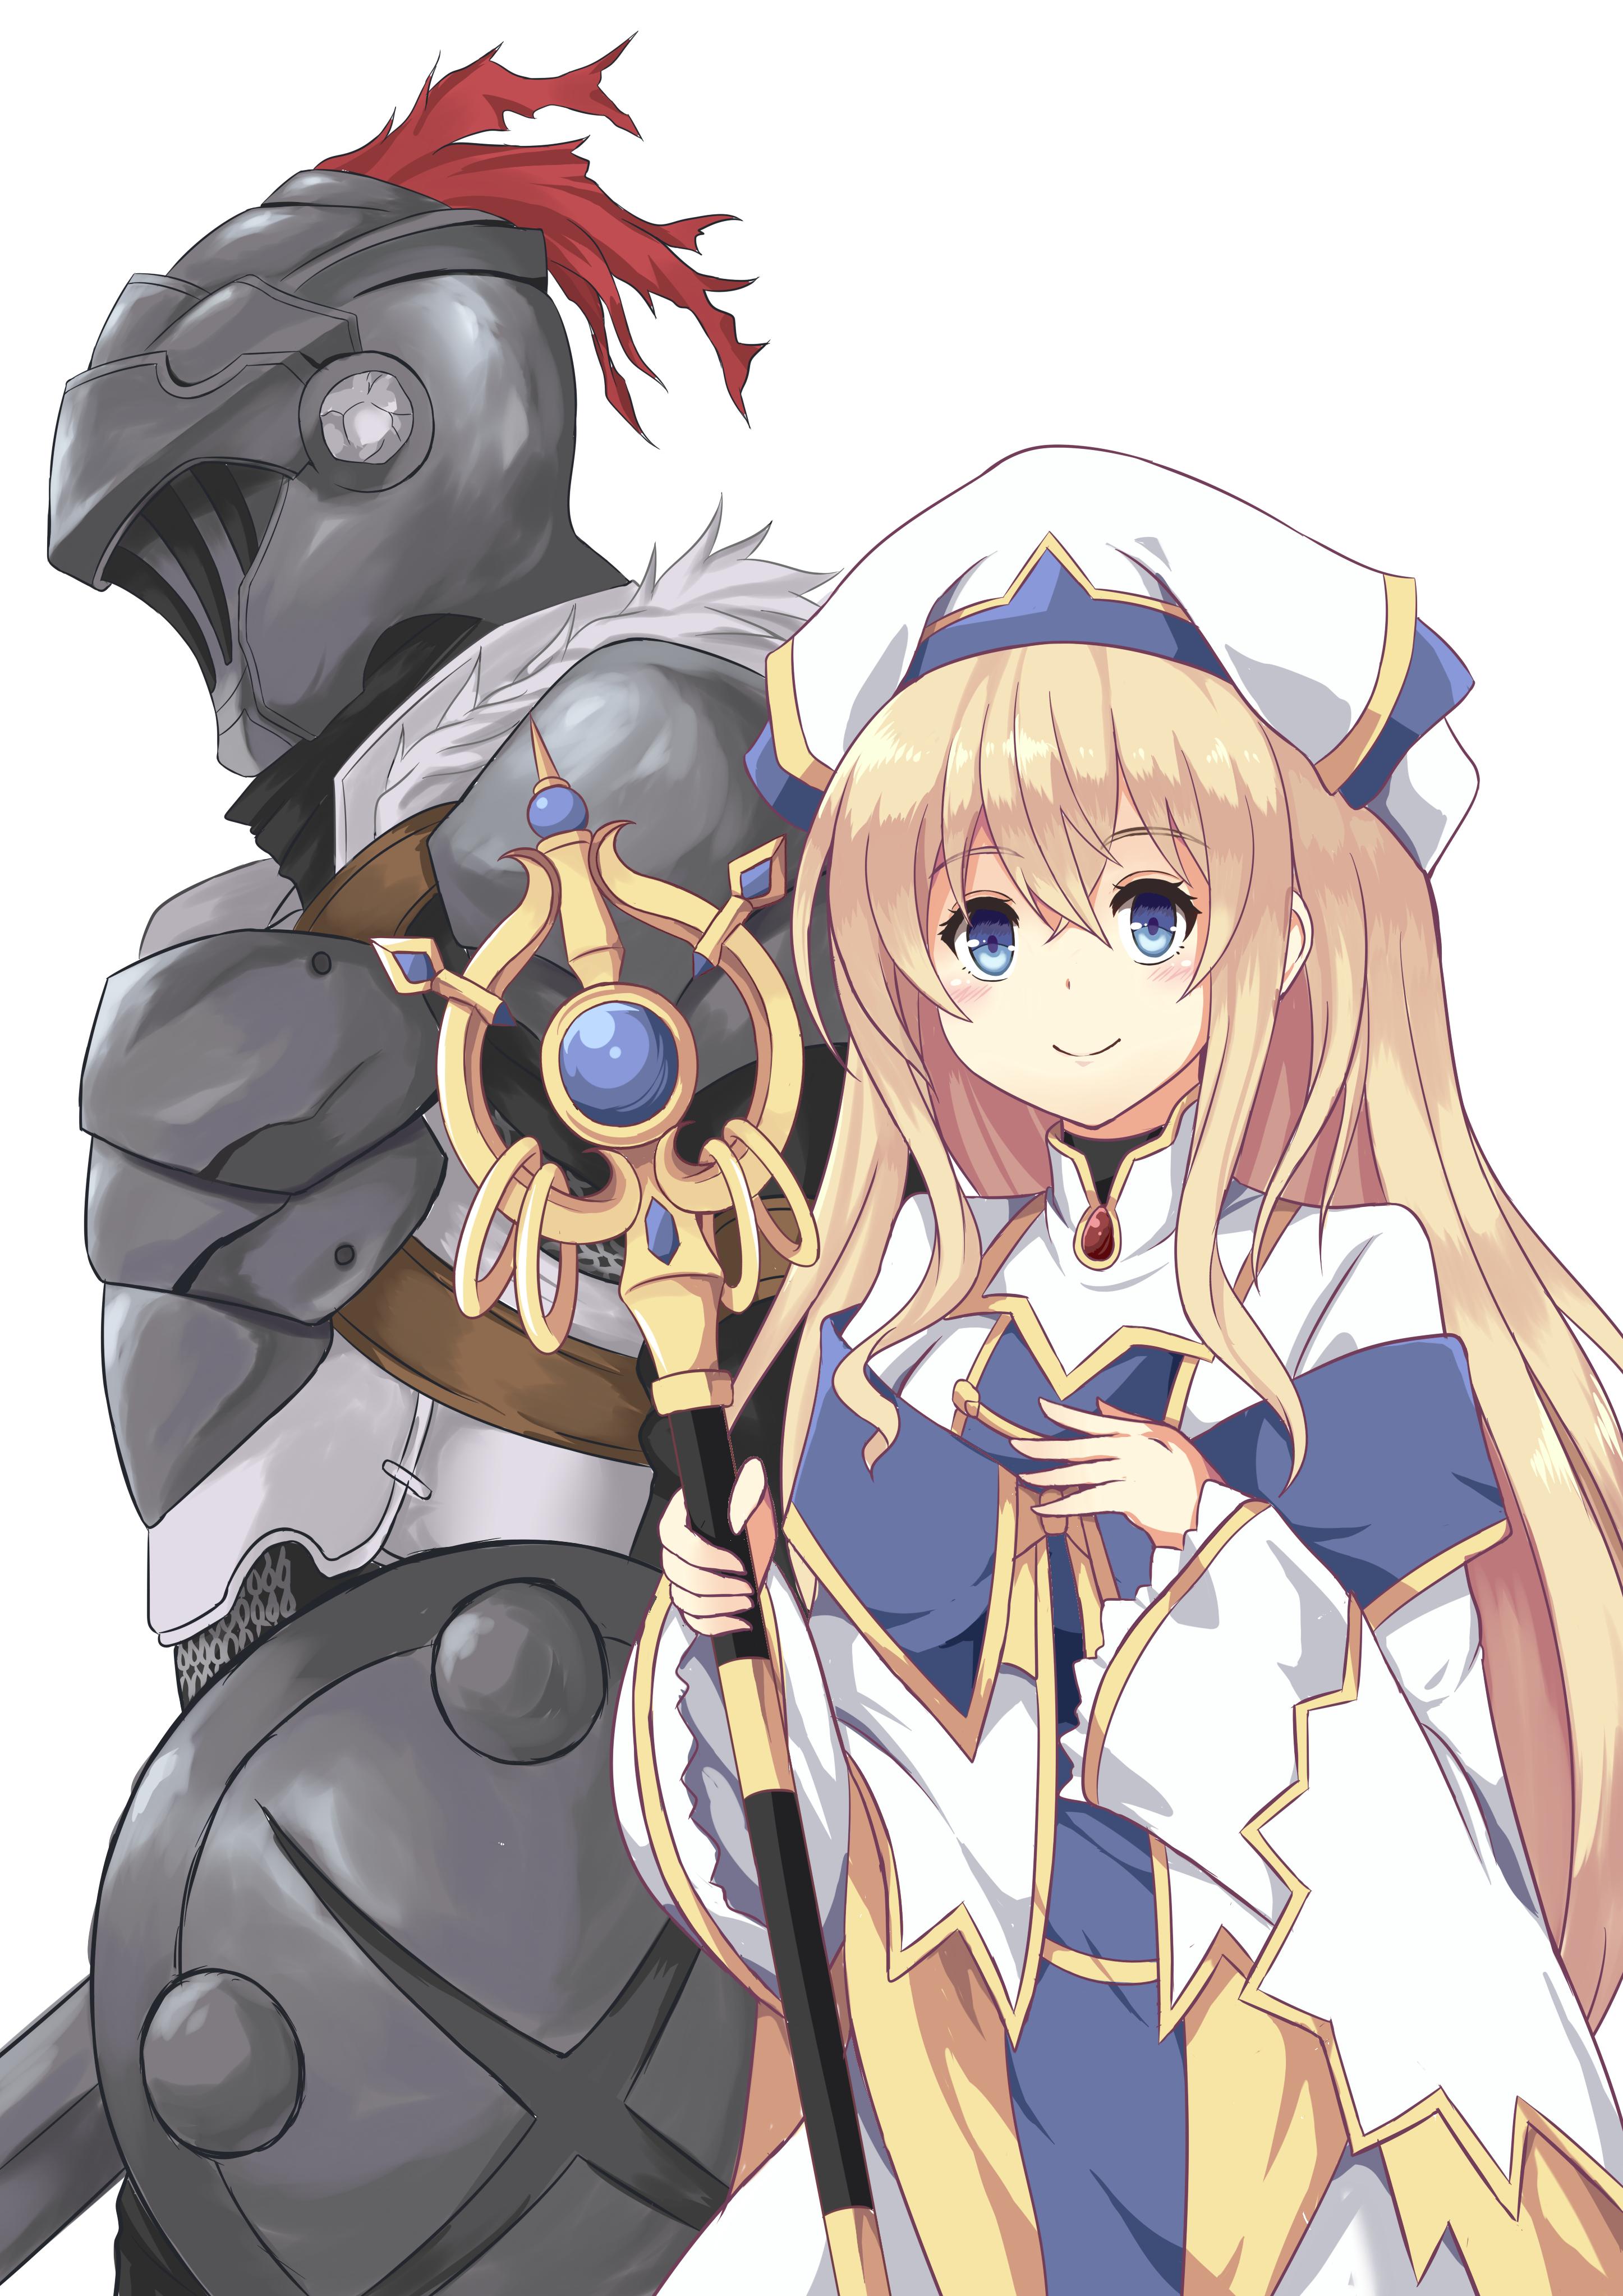 Goblin Slayer Y La Sacerdotisa Cute Anime Character Anime Slayer